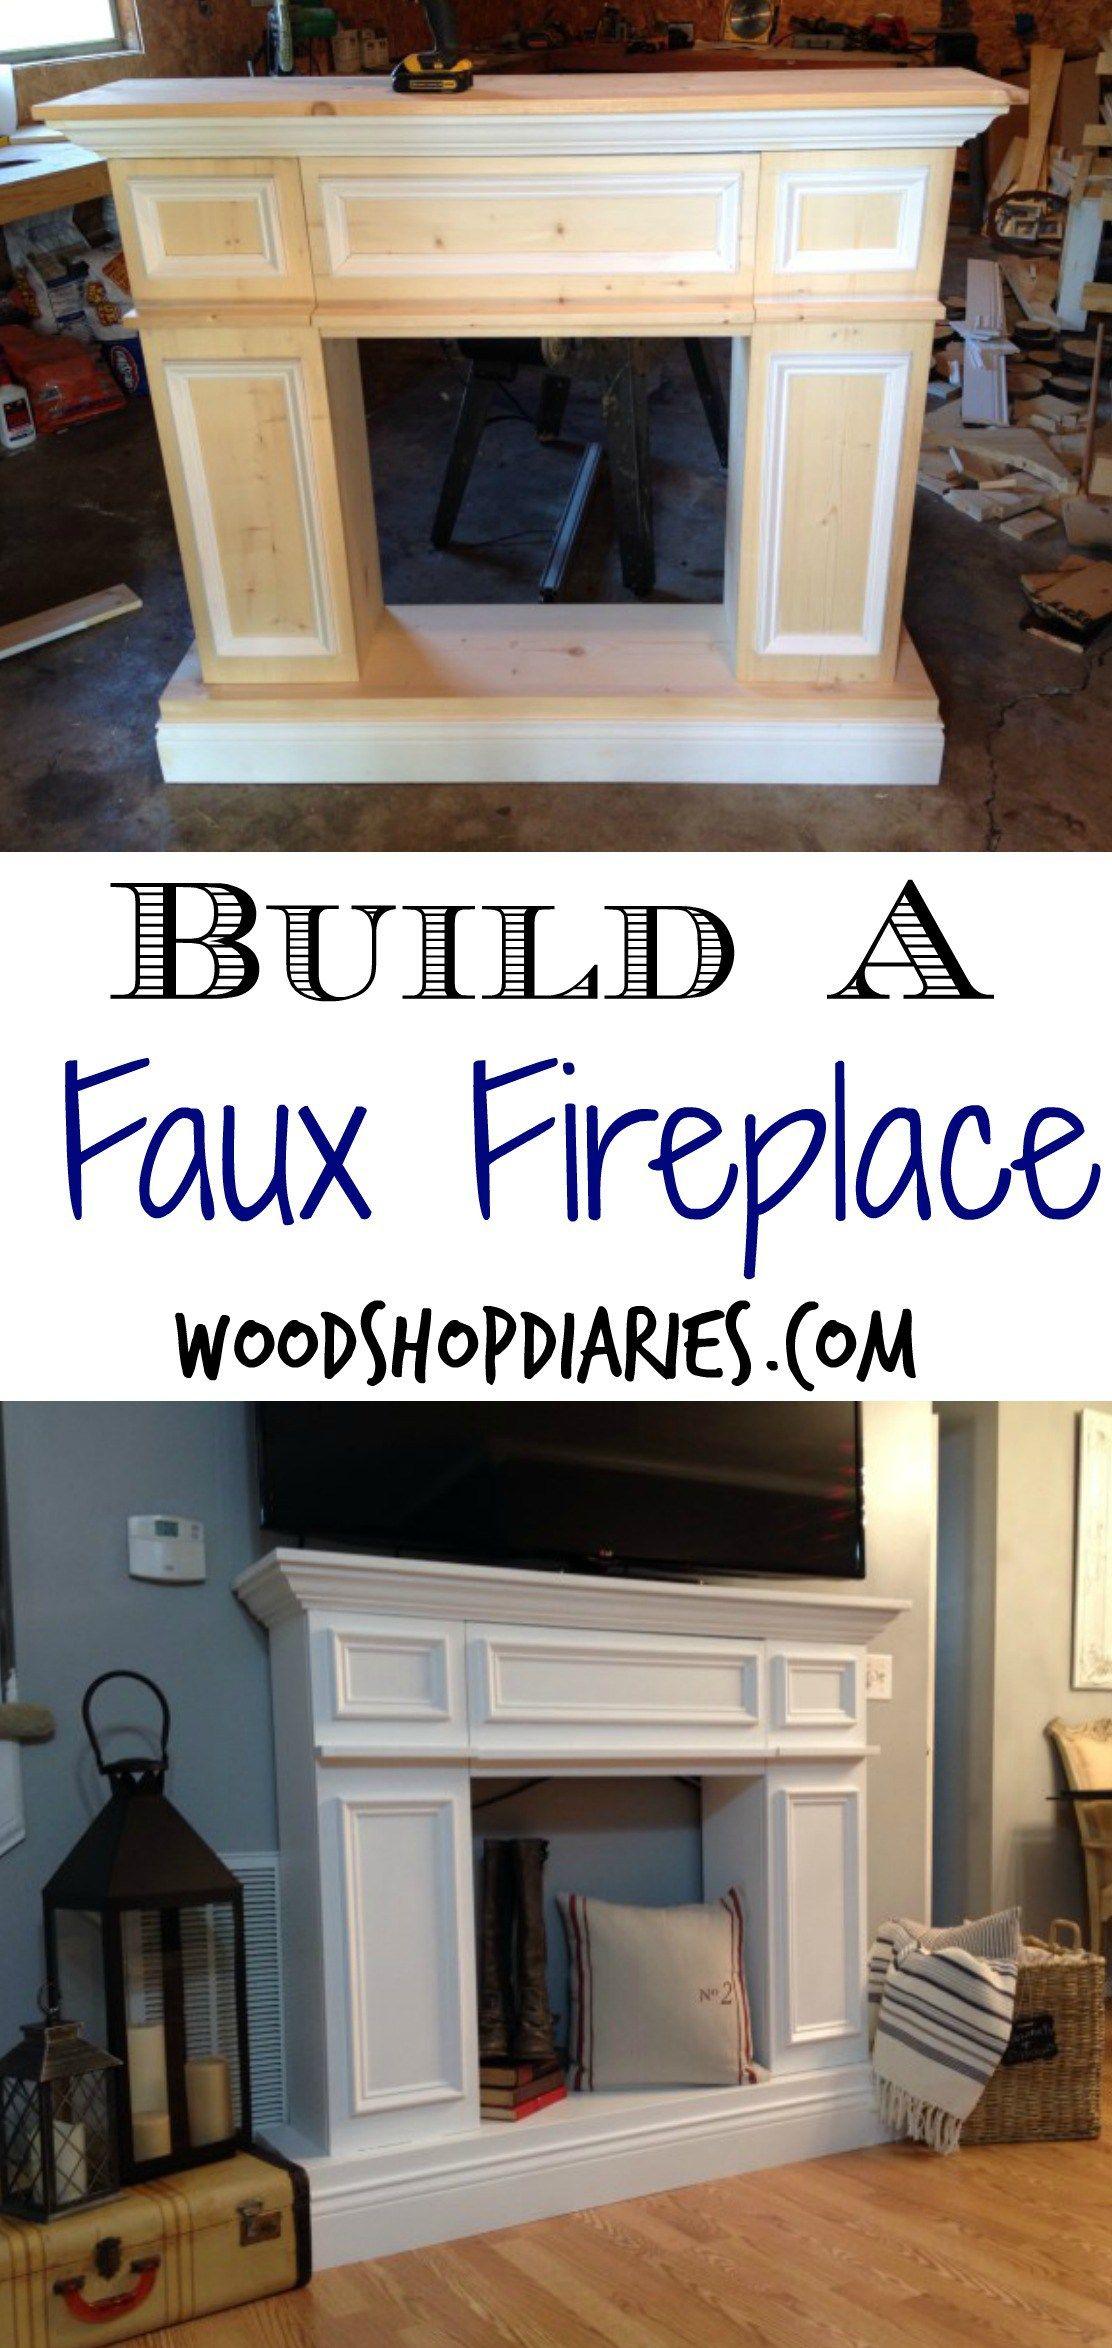 Fake It Til You Make ItThe Making of a Faux Fireplace kandalló